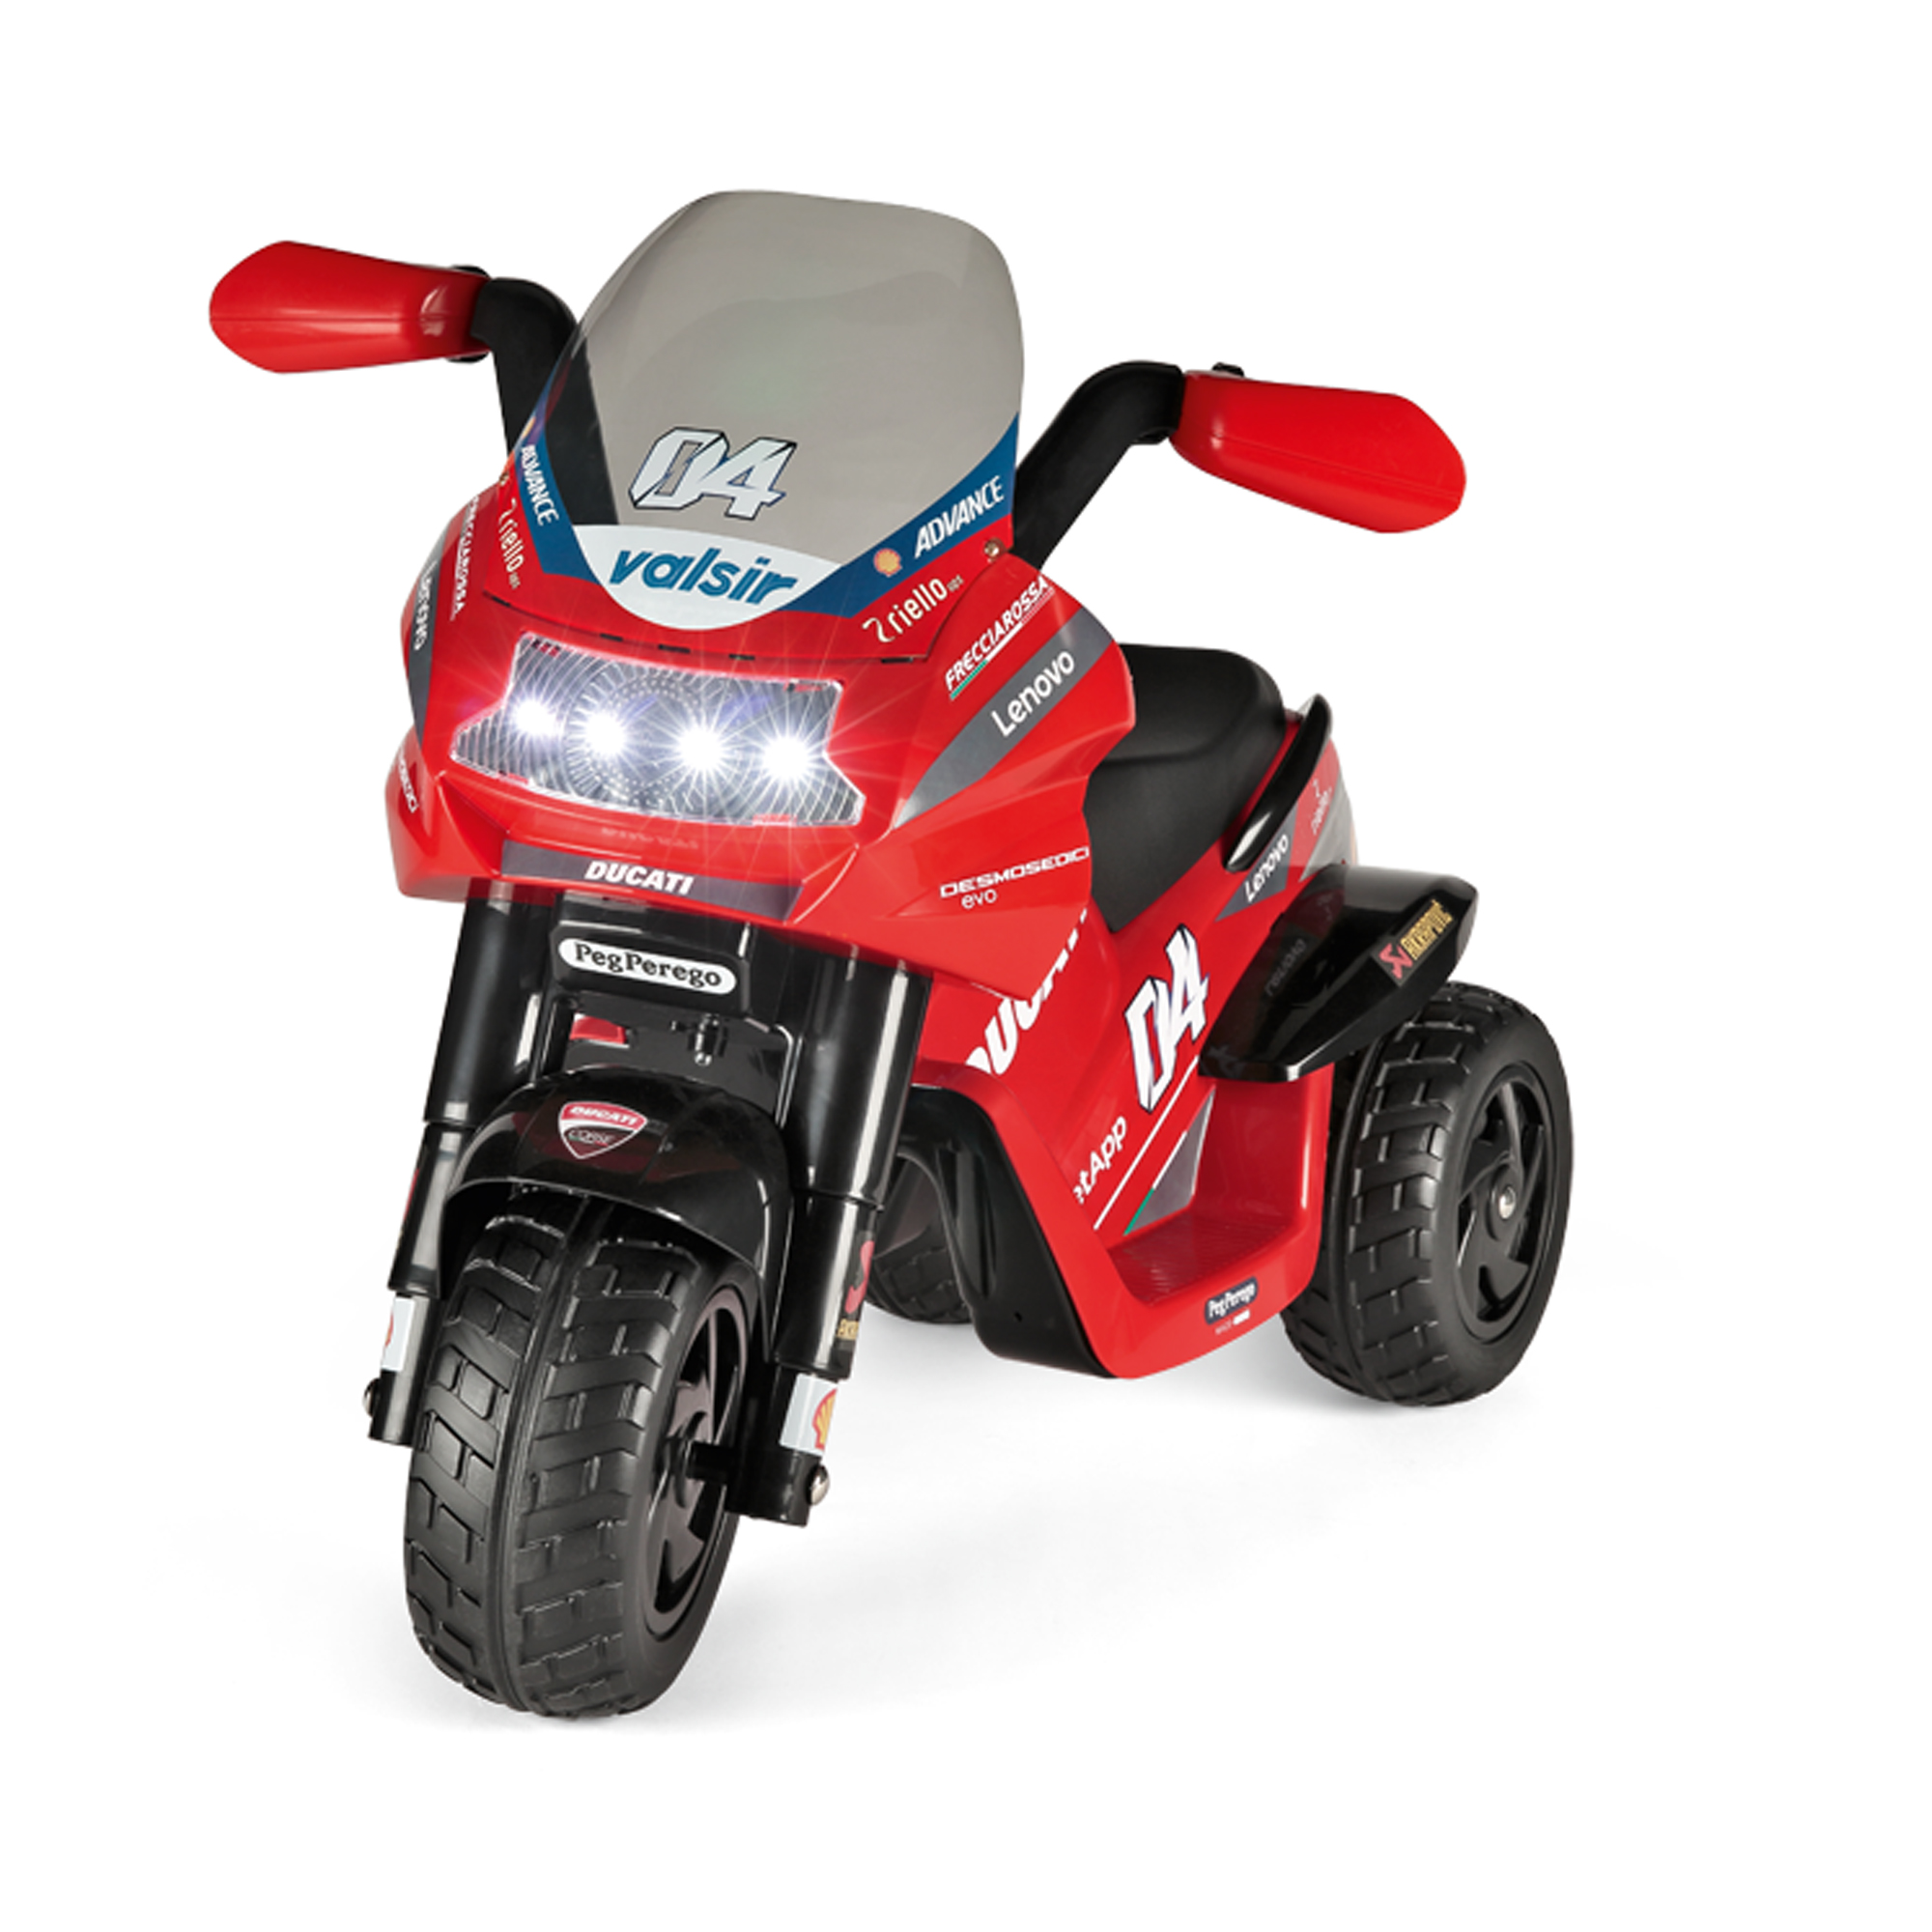 Motocicleta electrica Peg Perego Ducati Desmosedici Evo, 6V, 2 ani +, Negru / Rosu